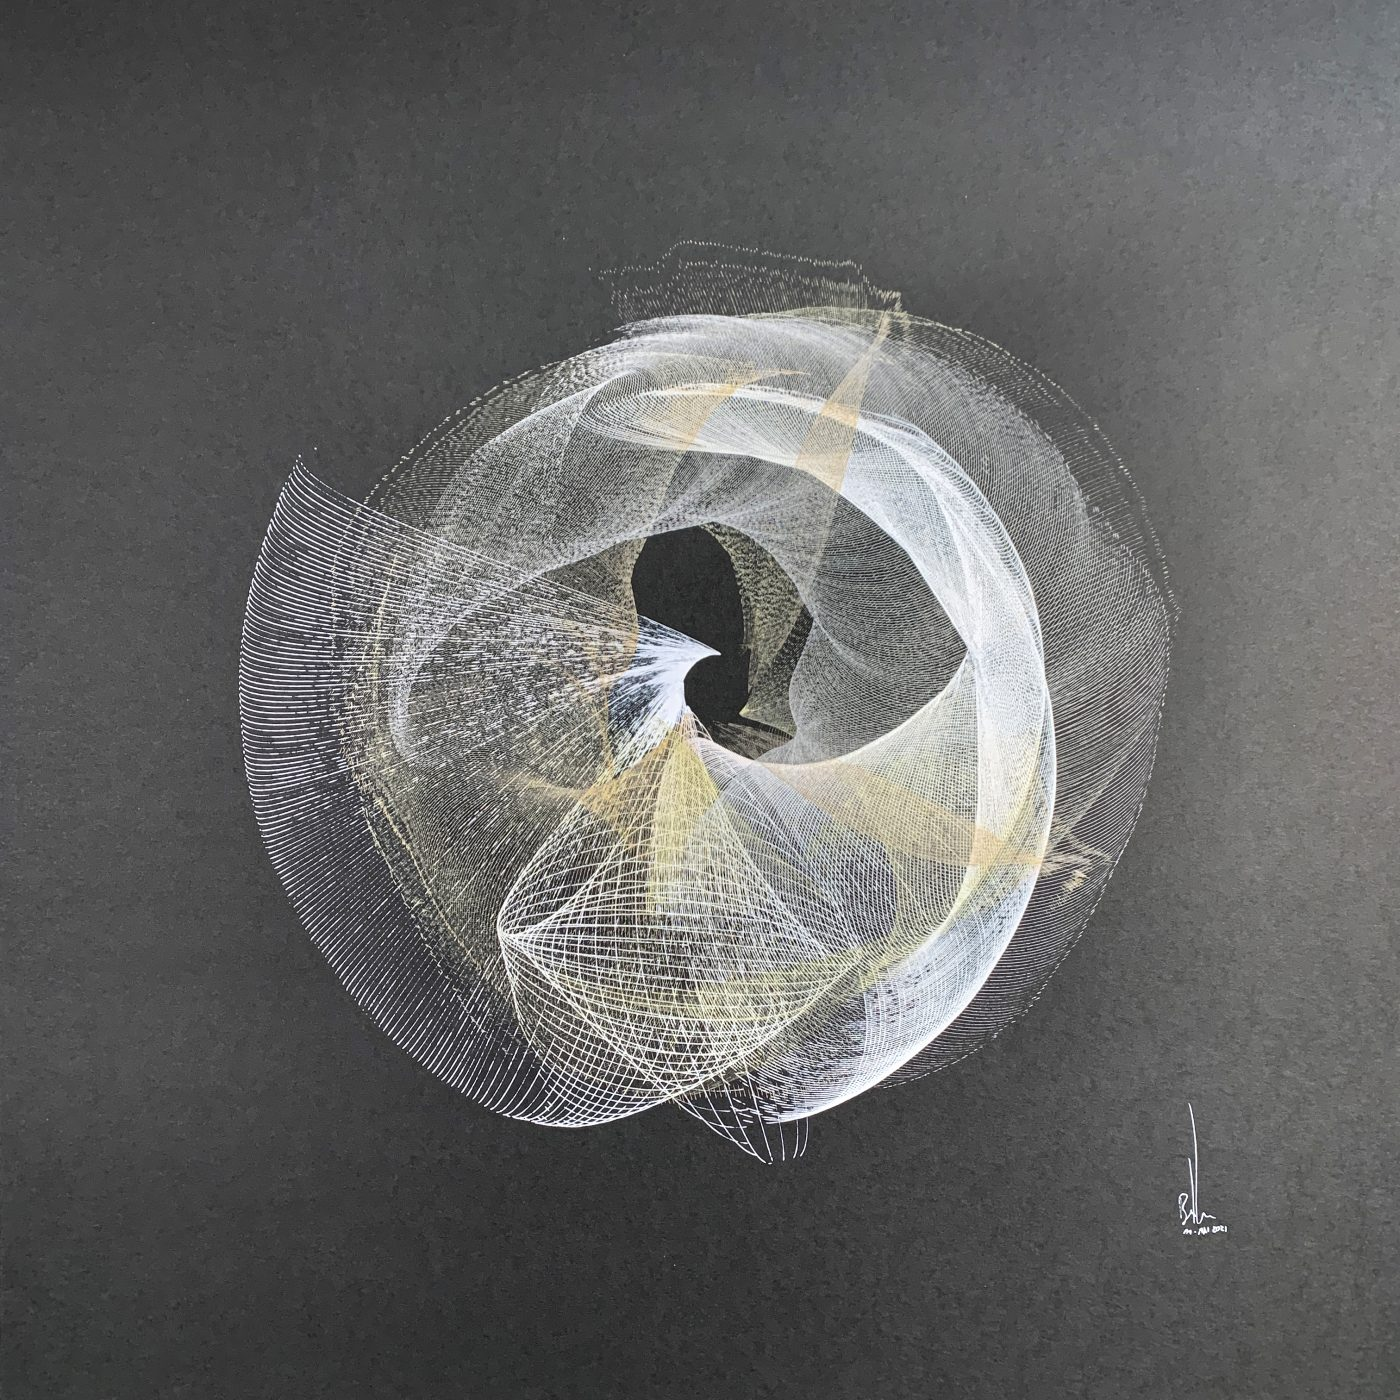 x497 - 11 Mai 2021